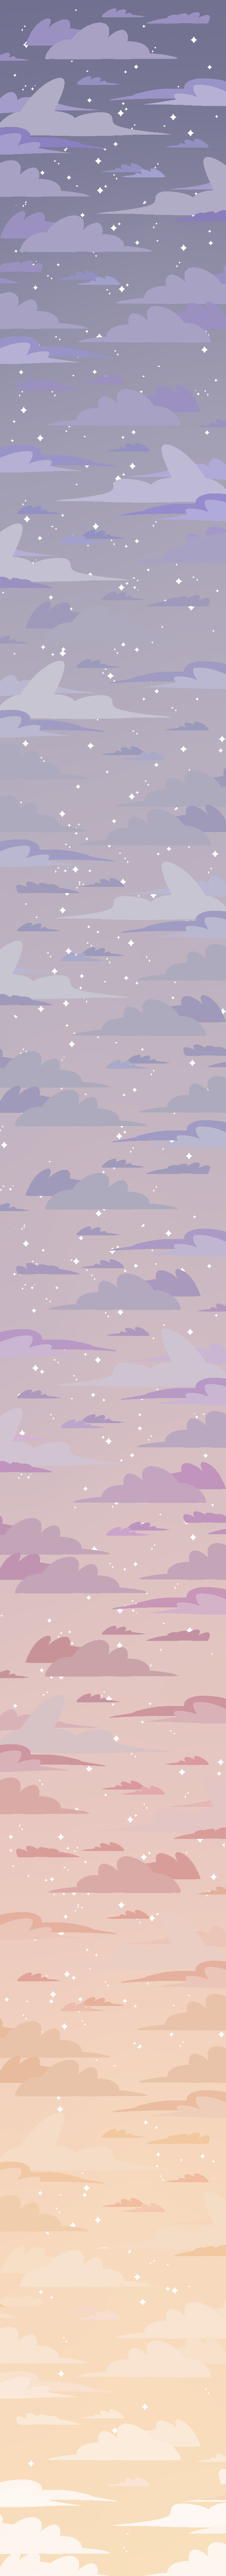 pixel sky custom box + variations by Pyraella